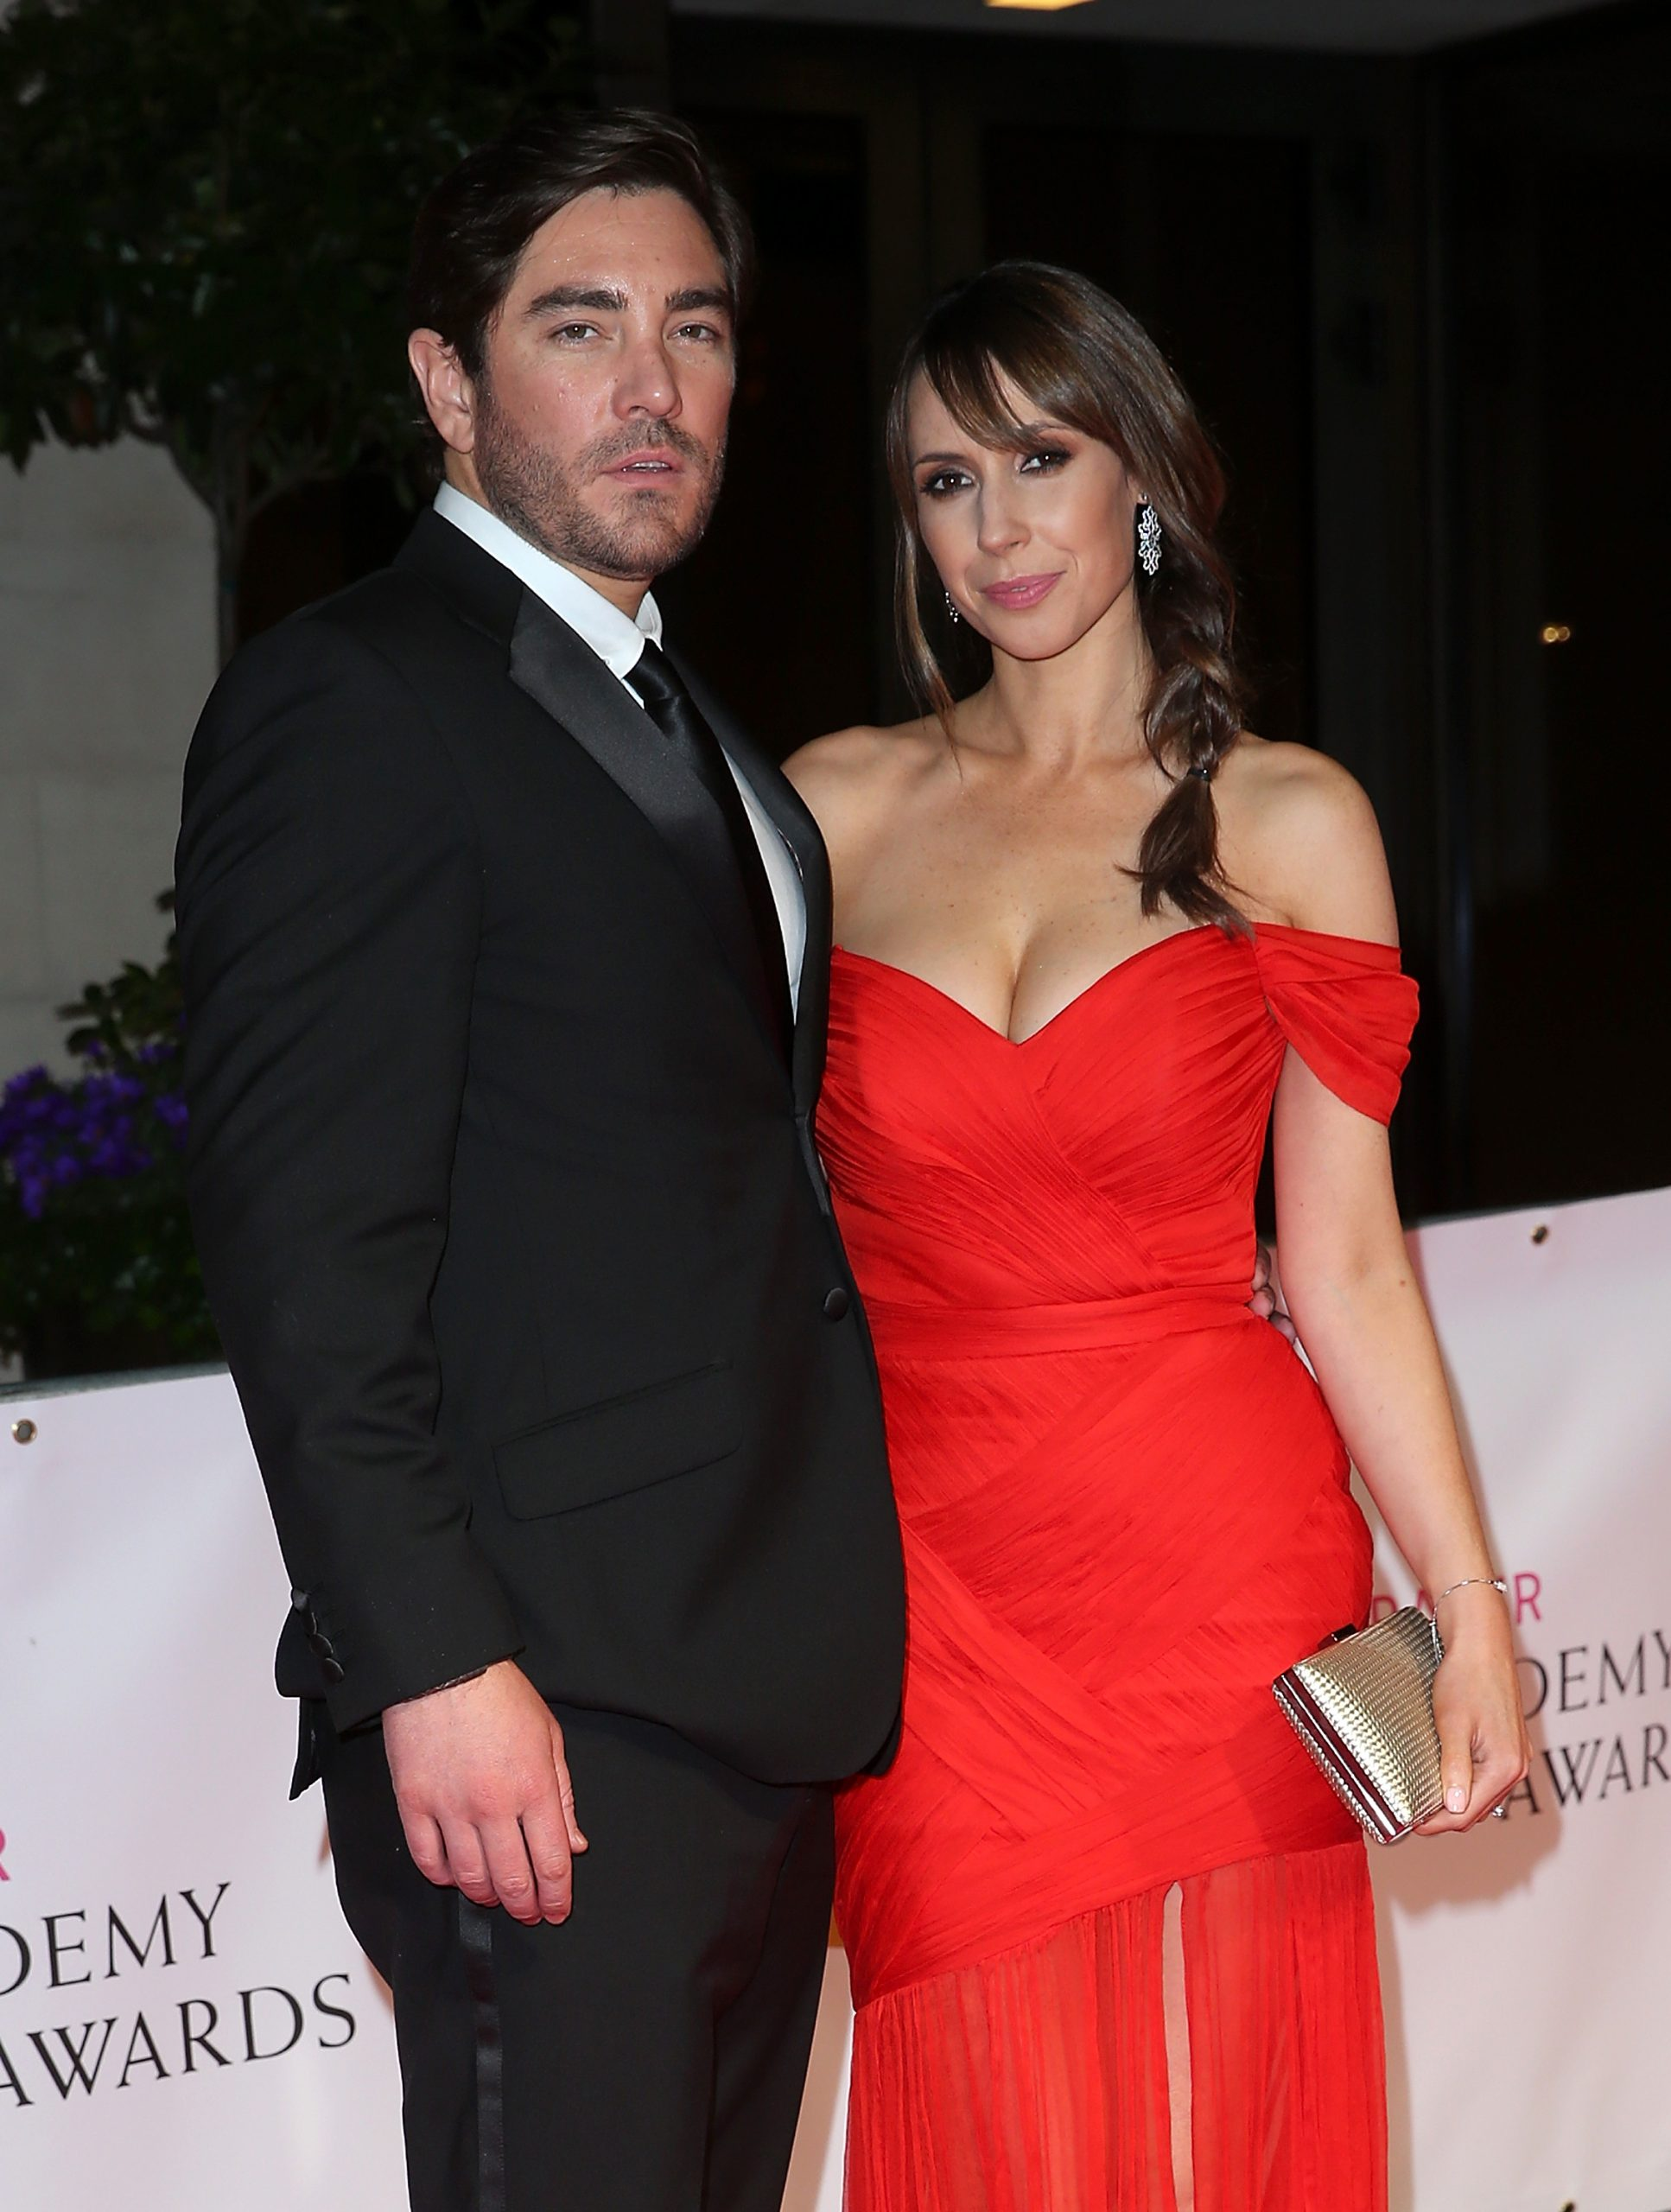 Charlie Thomson (L) et Alex Jones assistent au dîner de l'After Party des House of Fraser British Academy Television Awards à l'hôtel Grosvenor House le 10 mai 2015 à Londres, en Angleterre.